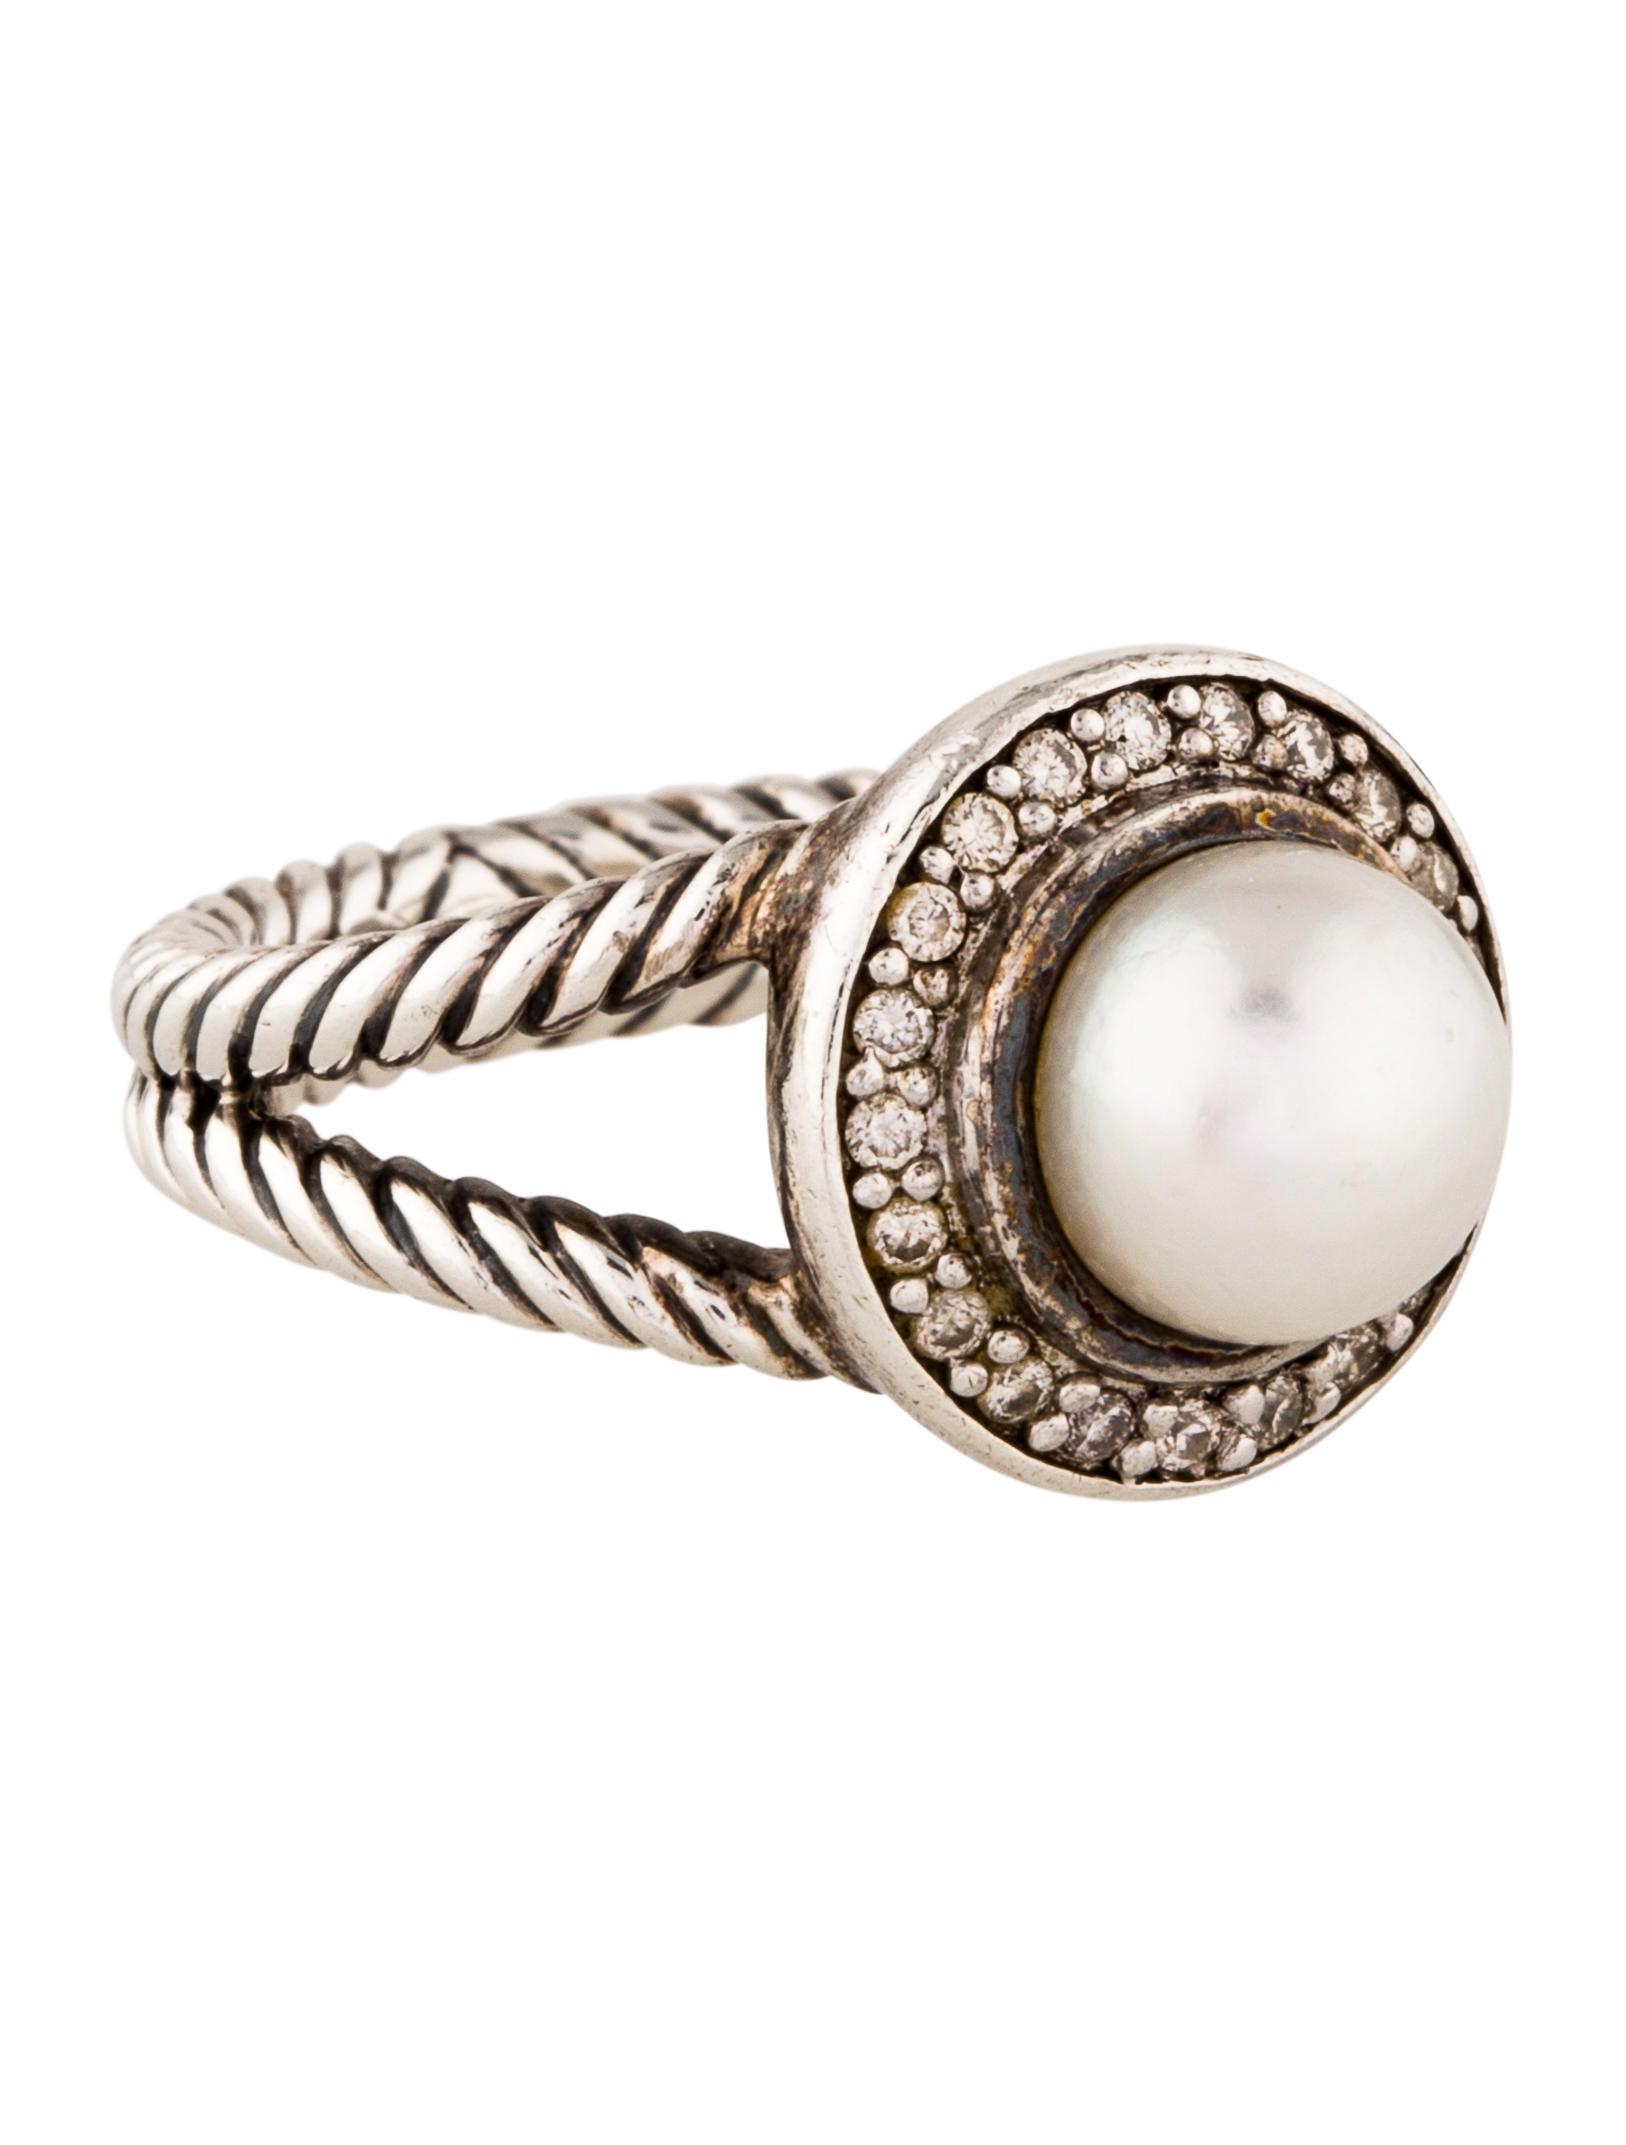 David yurman pearl diamond petite cerise cocktail ring for David yurman inspired jewelry rings